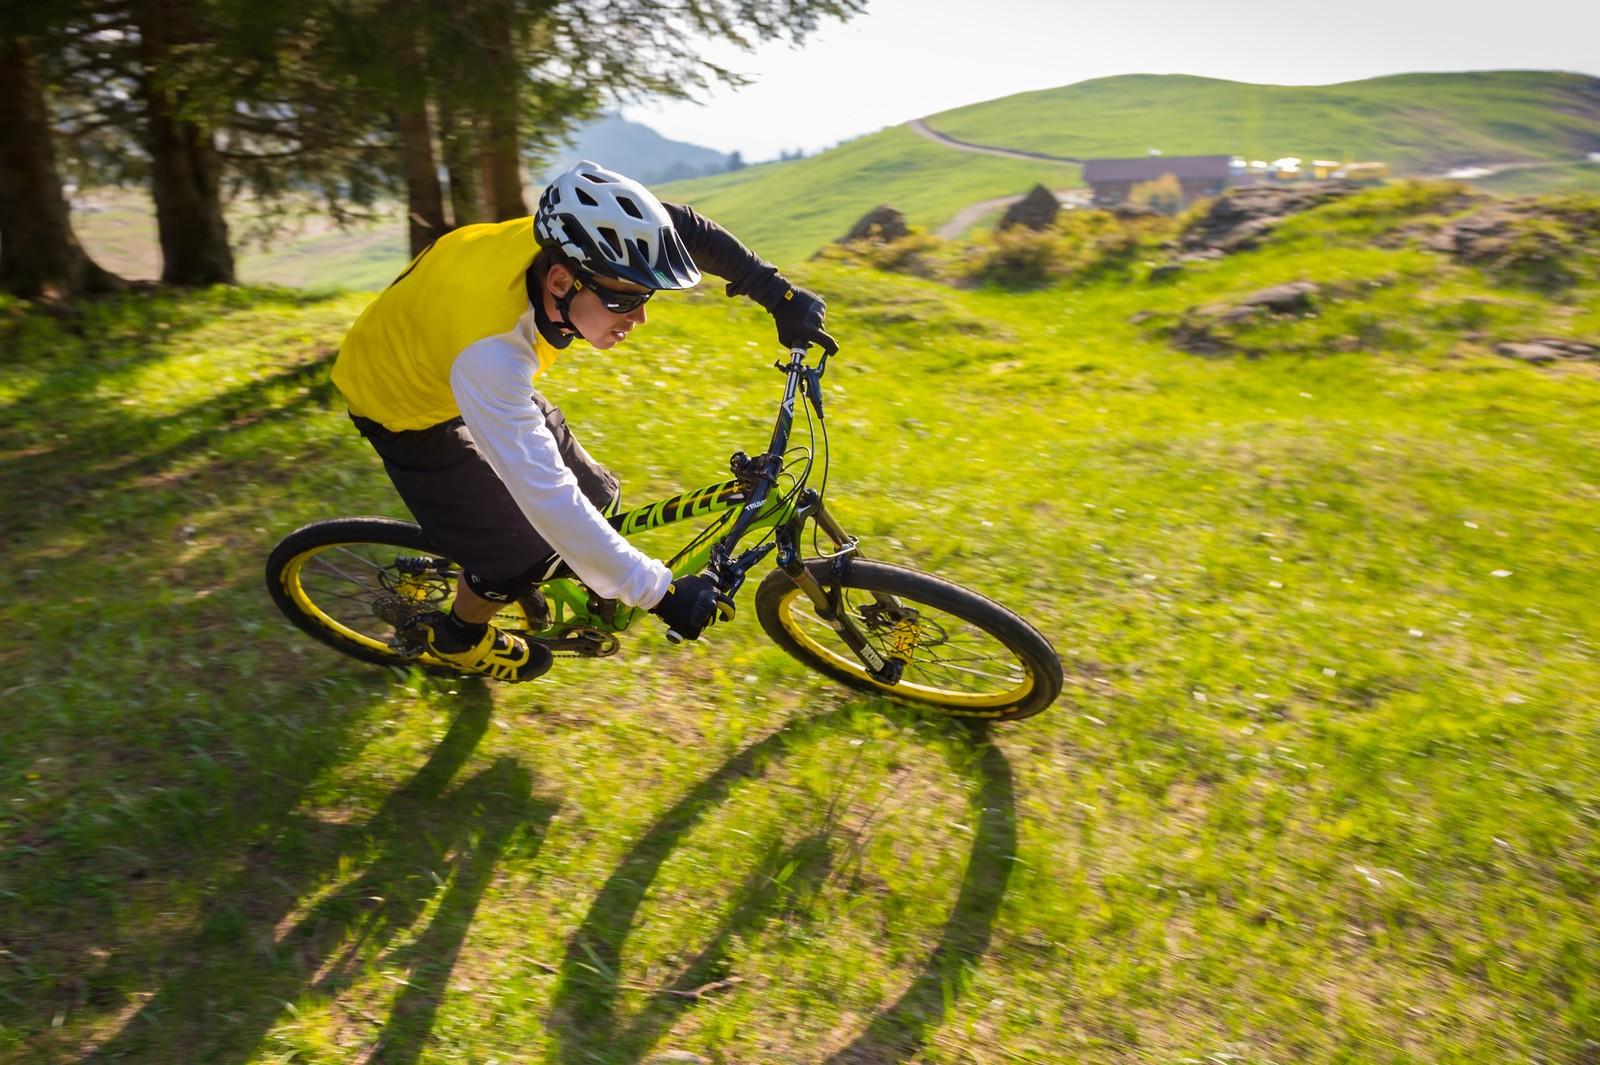 Mavic Launching New Enduro Wheel and Tire System - sspomer - Mountain Biking Pictures - Vital MTB